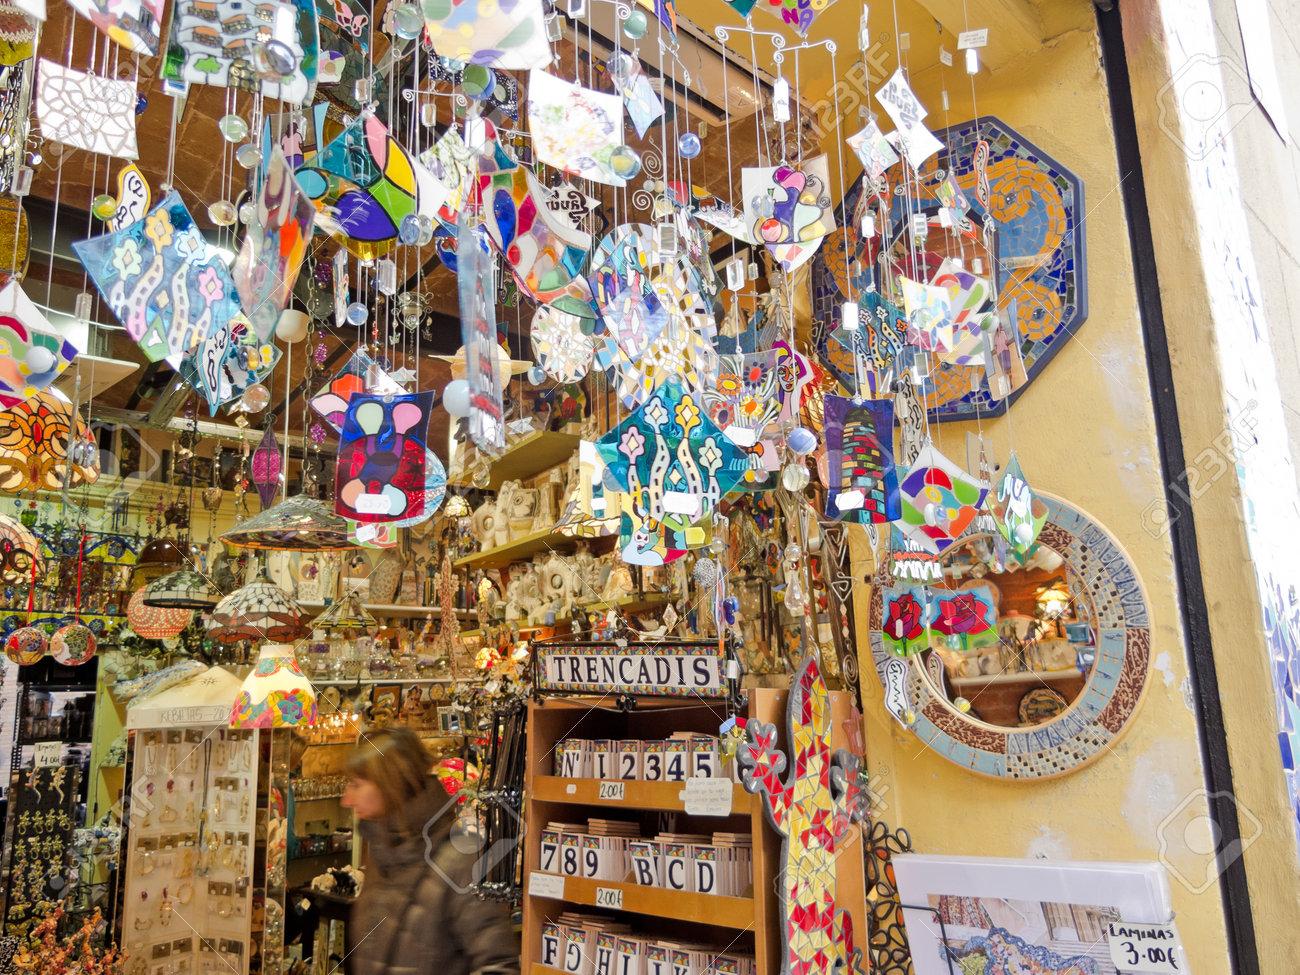 6df3e48a97817 Photo barcelona dec souvenir shop inspired gaudi and dali on december in  barcelona spain bar jpg